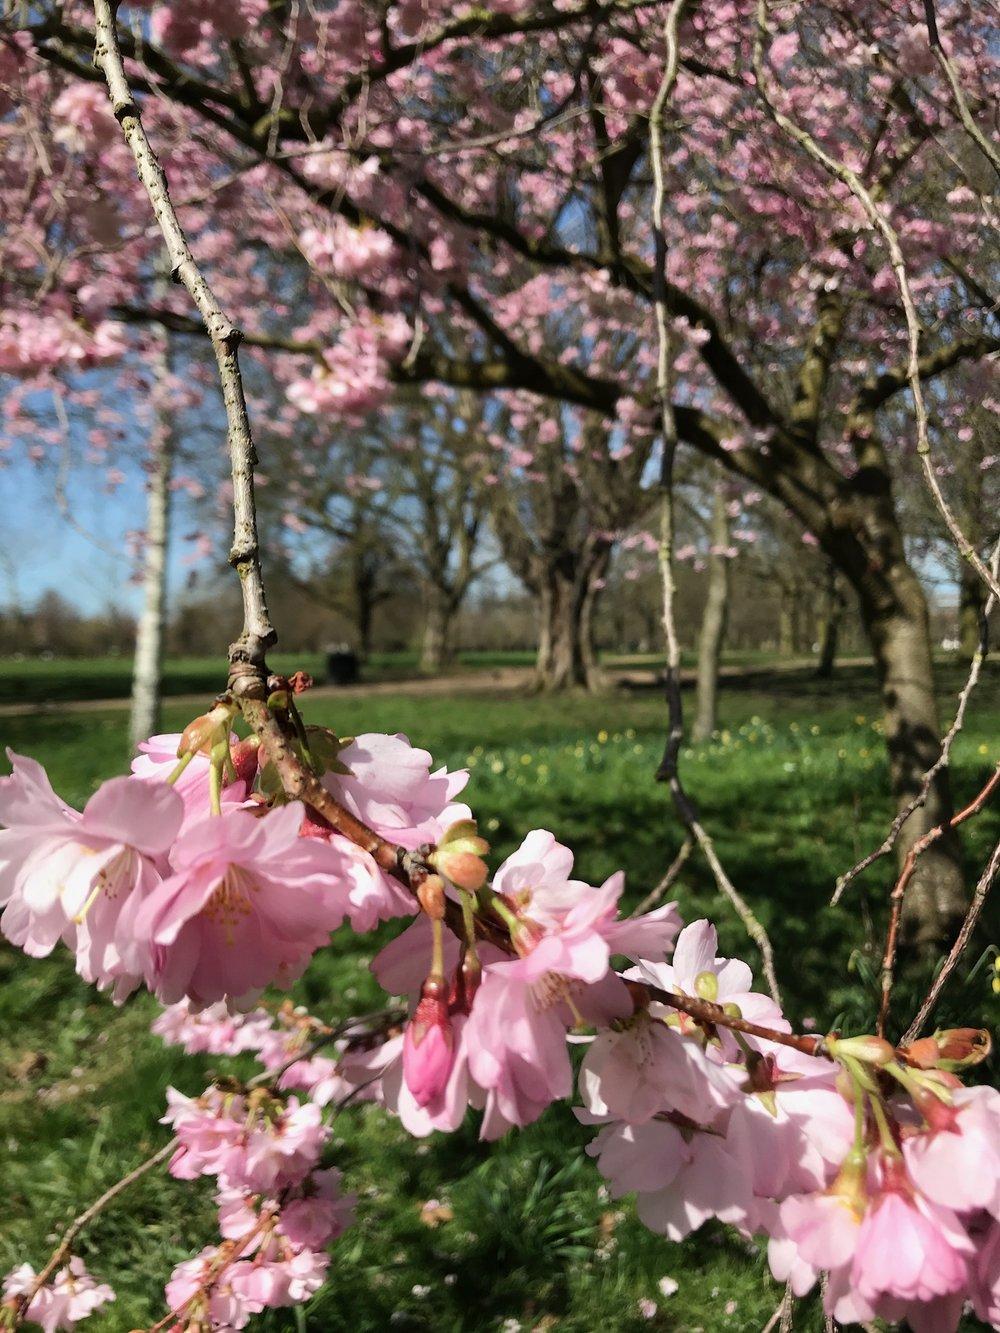 Spring in Walpole Park